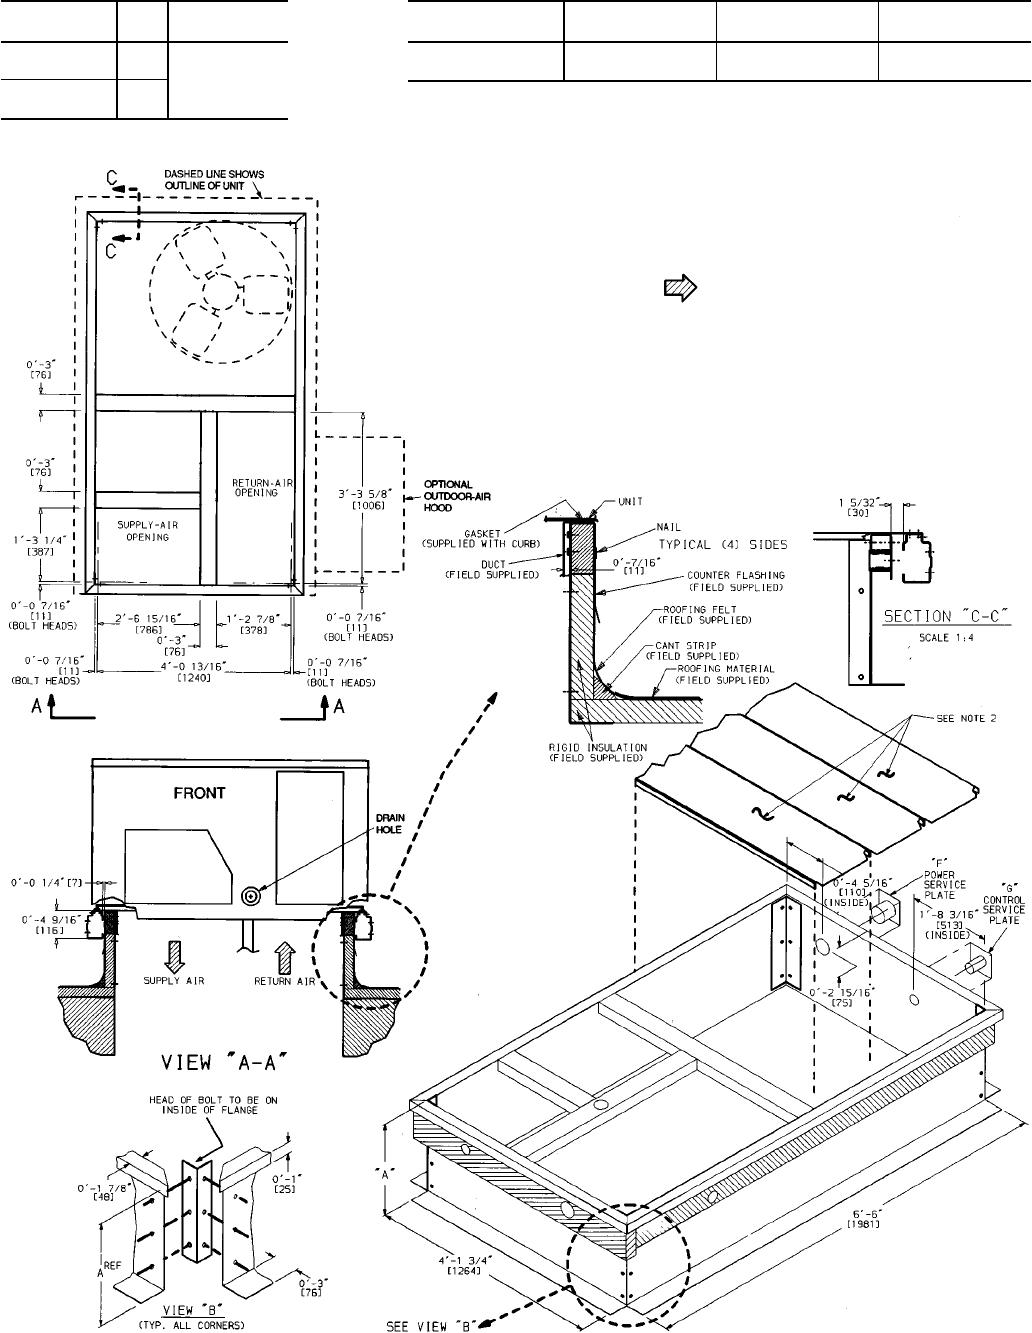 Carrier 012 50ljq008 Fig 1 Roof Curb Dimensions